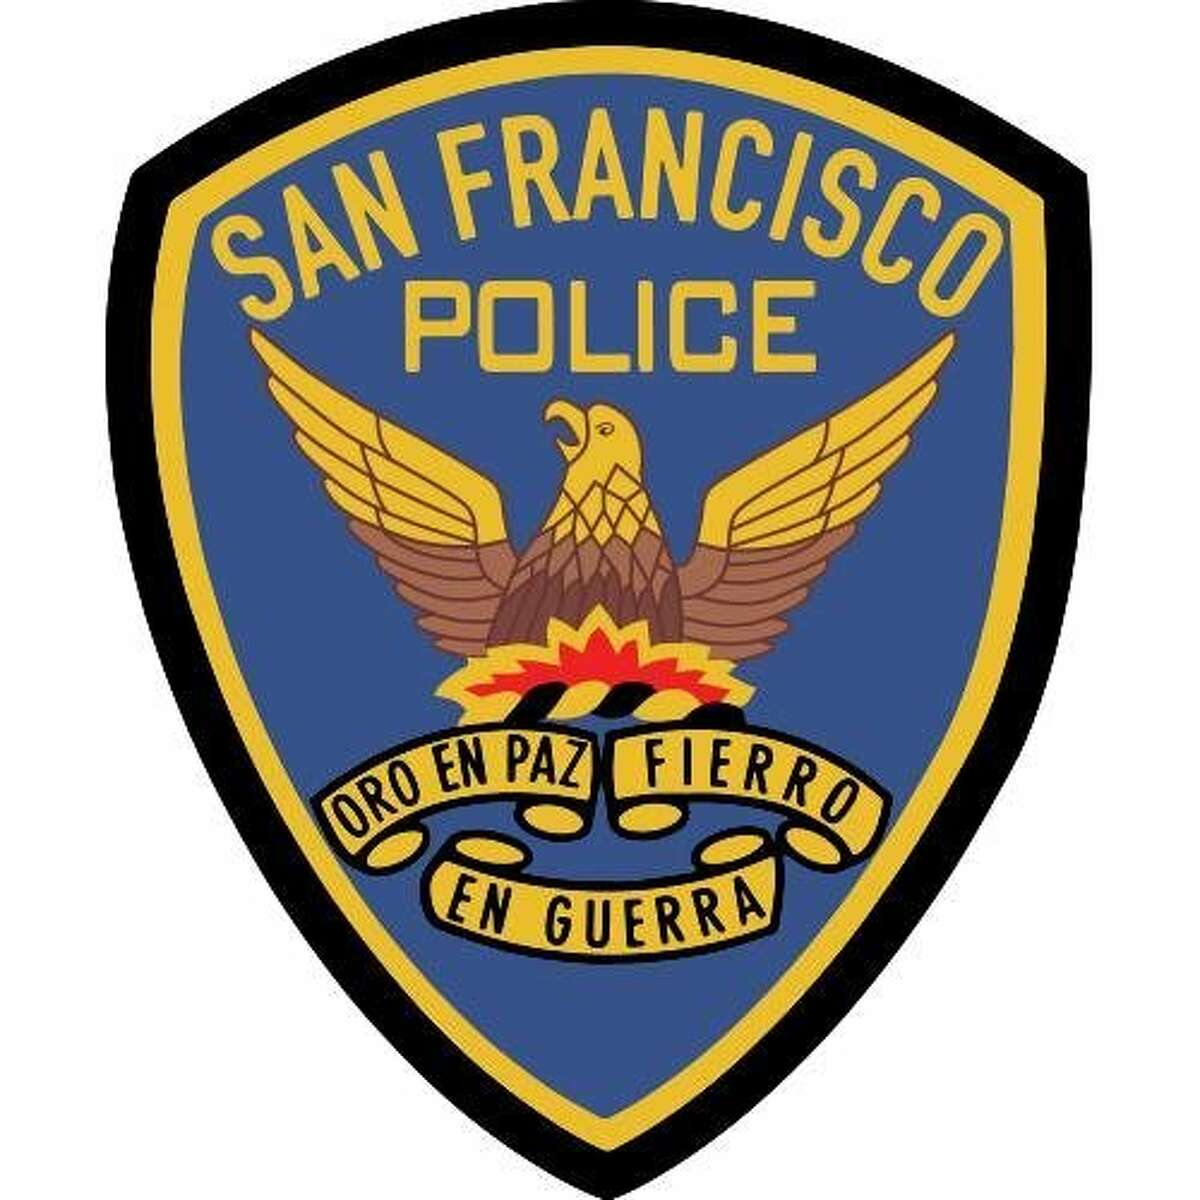 A San Francisco Police Department insignia.